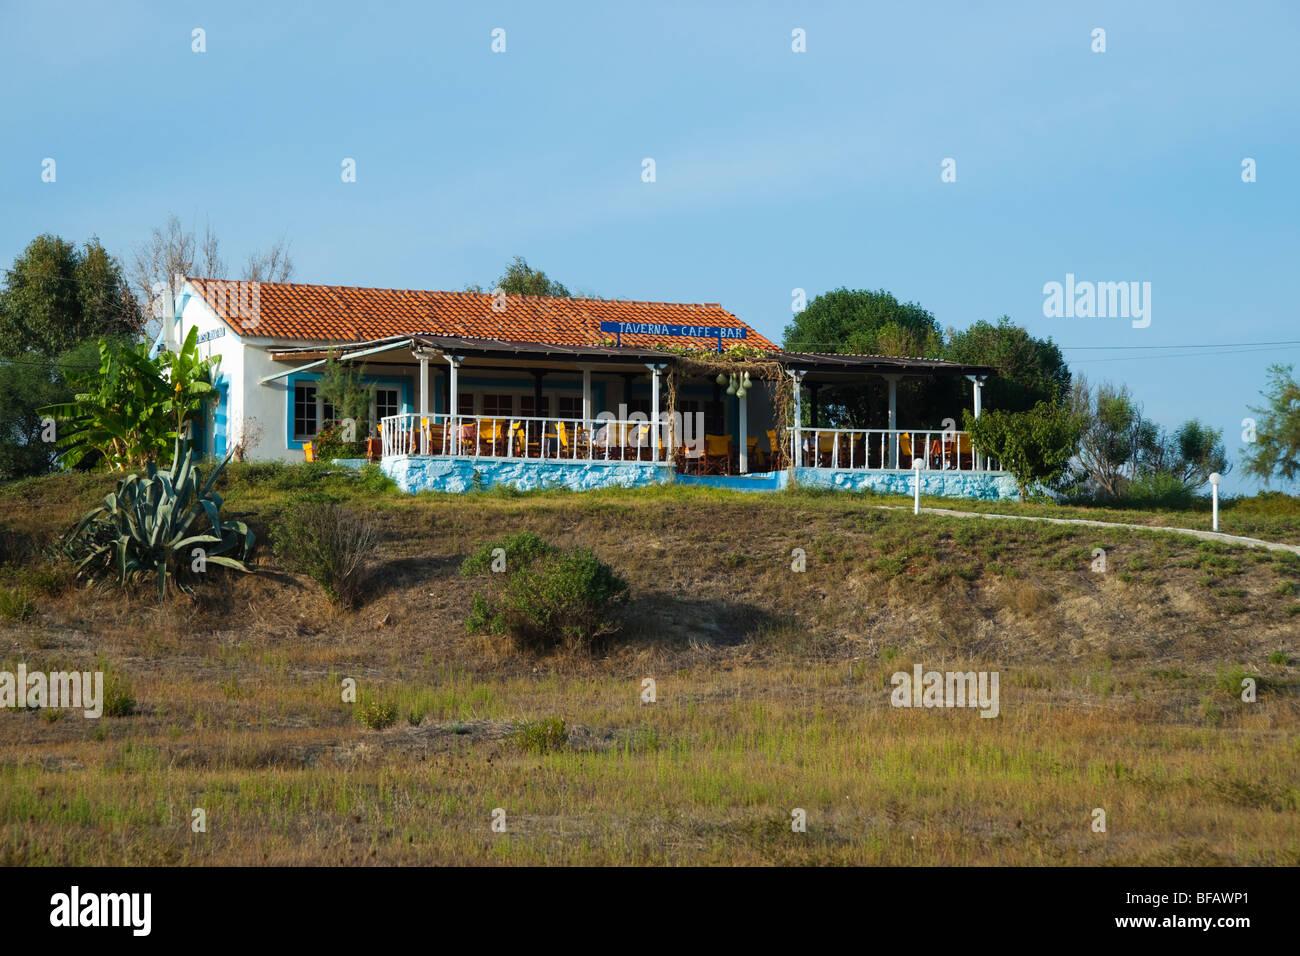 Xi beach near Lixouri on the Pali peninsular of Kefalonia - beach restaurant - Stock Image